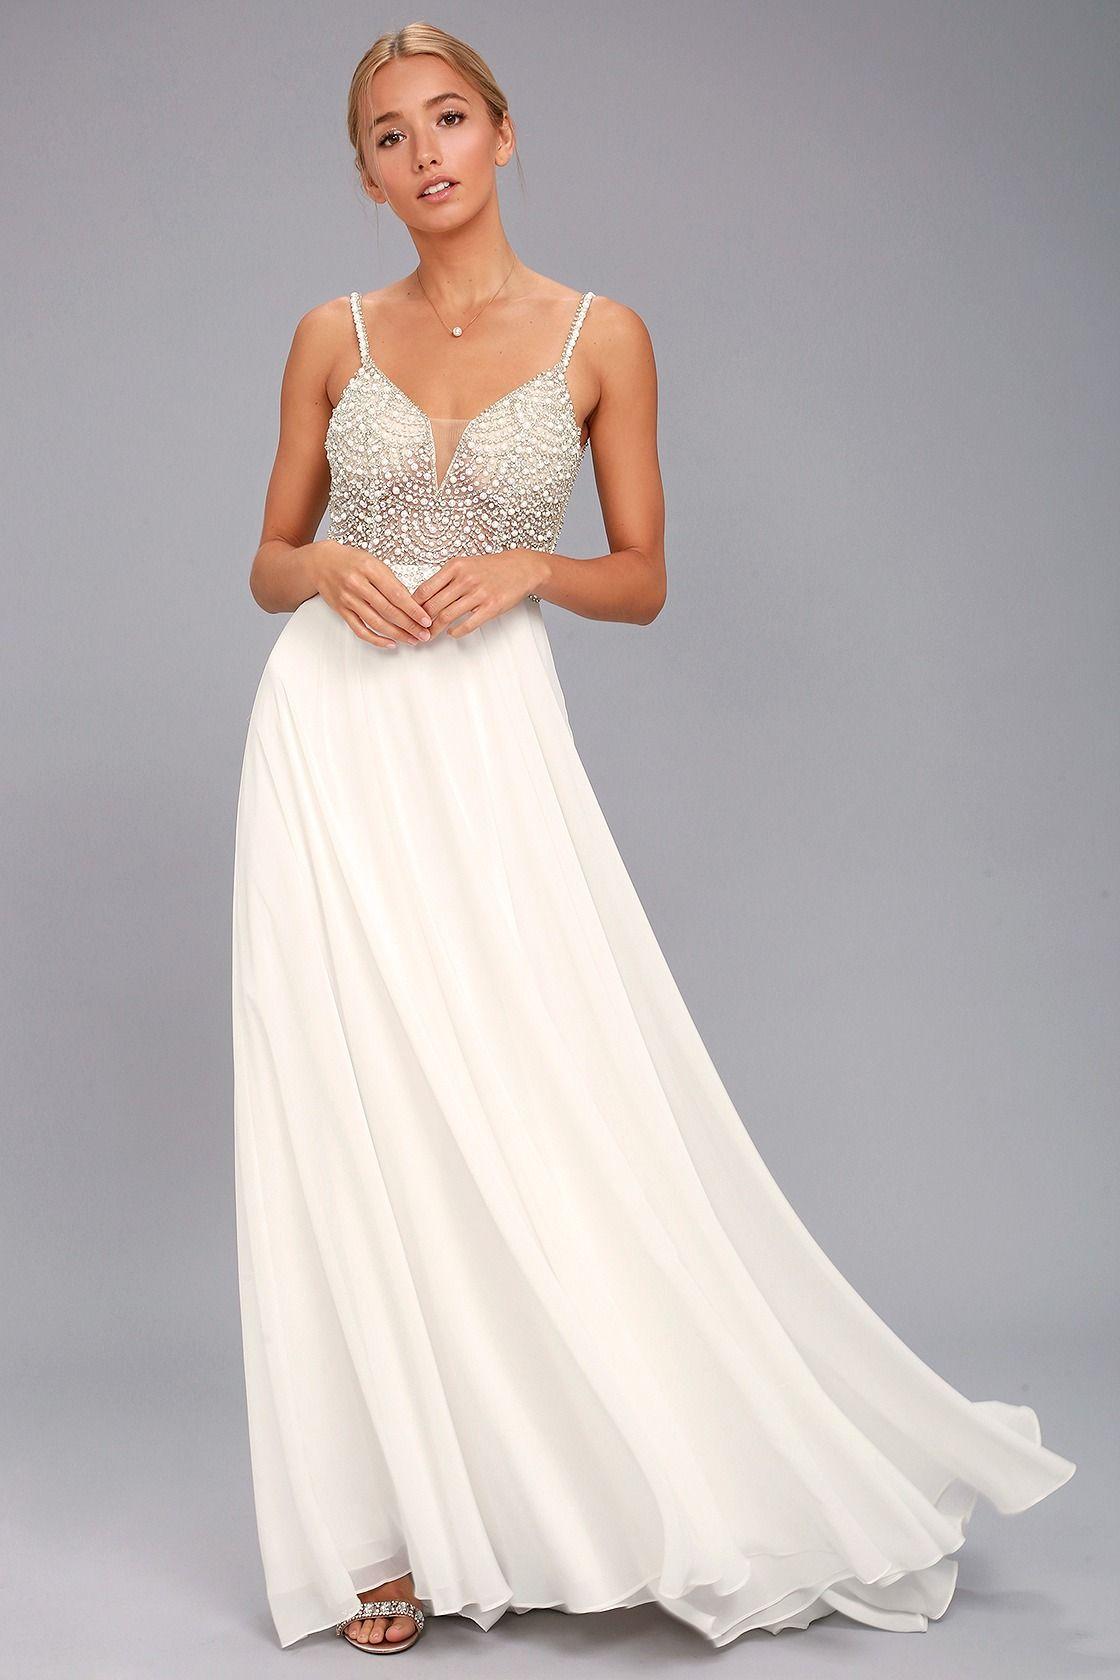 Pregnant wedding dress fail  Pin by Theresa G on OliviauJulesuChiara  Pinterest